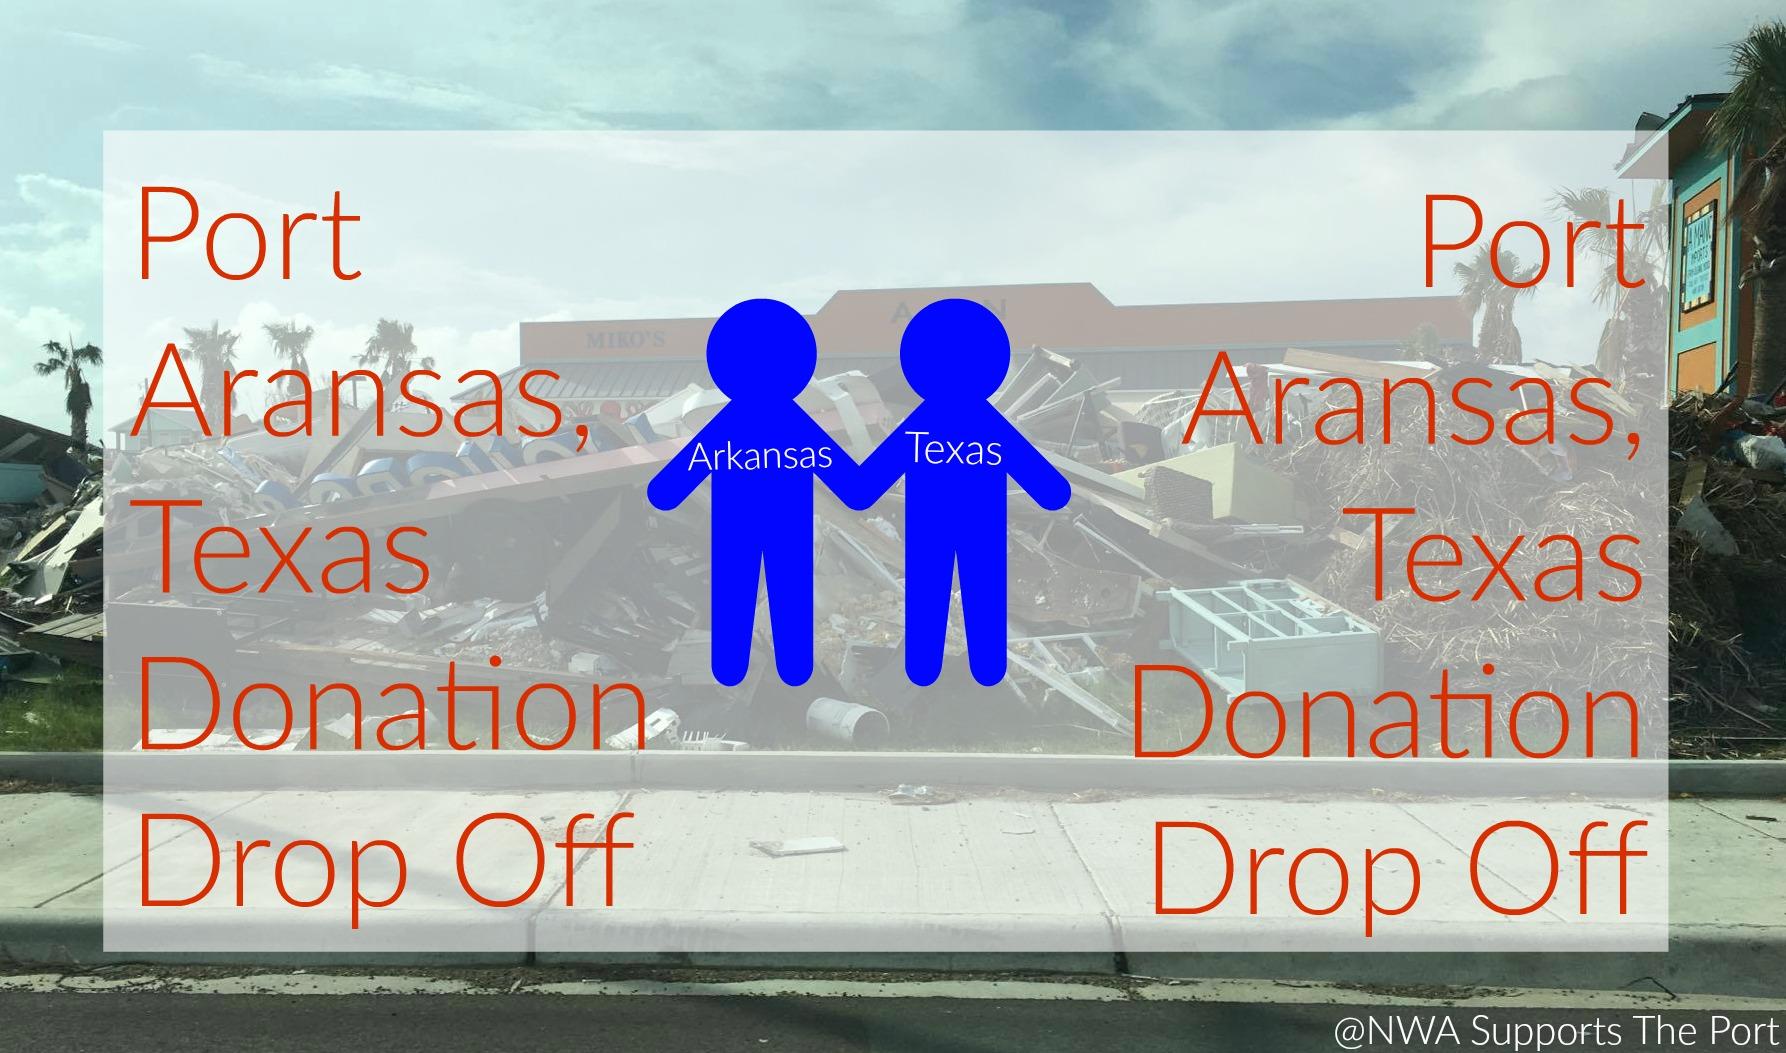 Donation drive